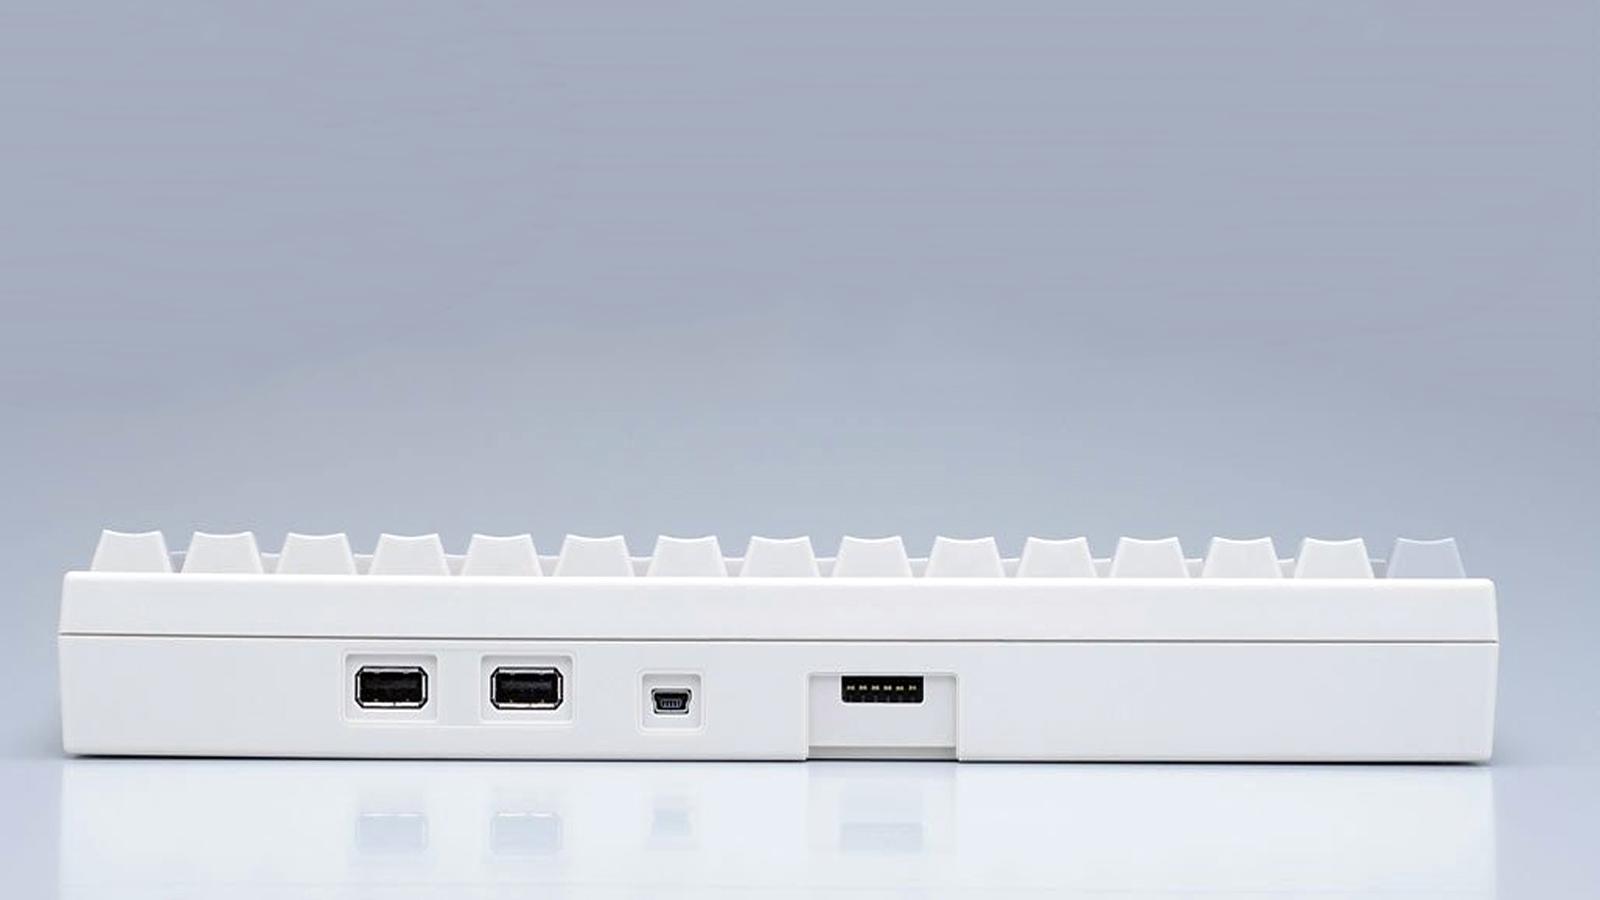 Задняя часть клавиатуры Happy Hacking Keyboard Professional 2 (белый цвет)